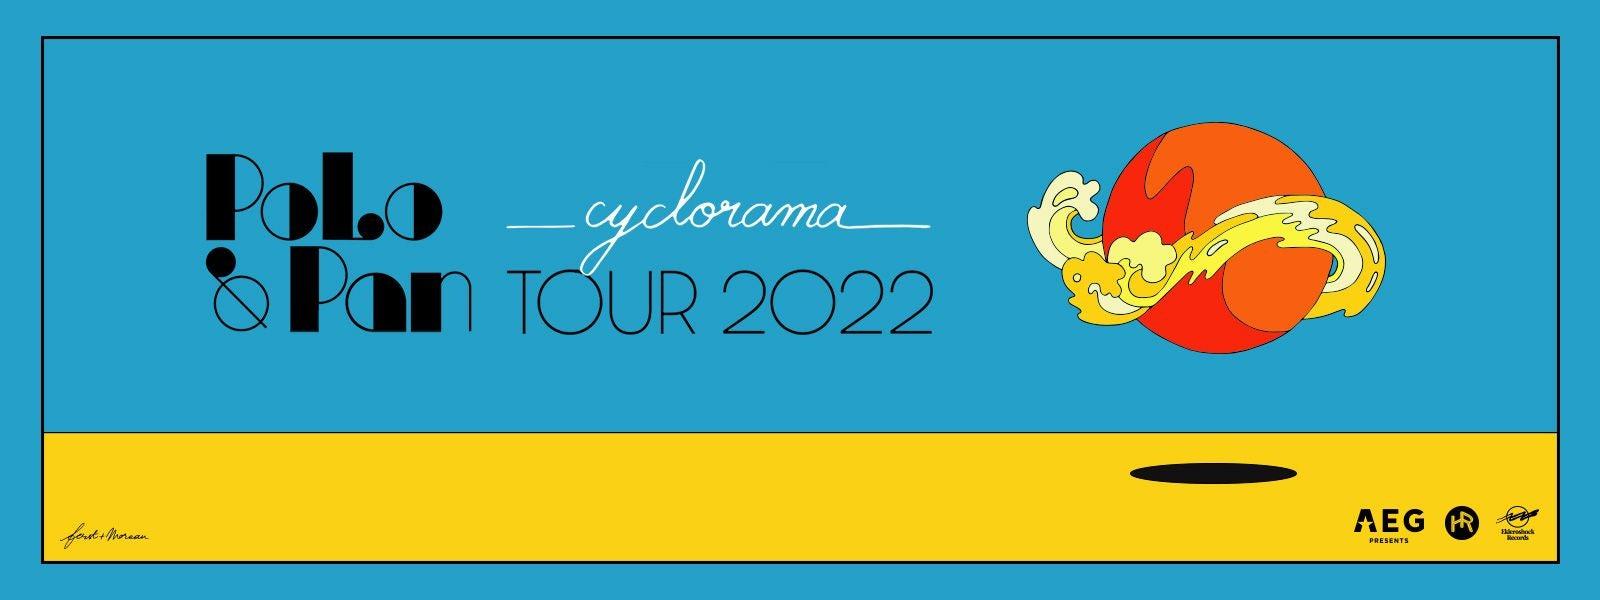 Polo & Pan : The Cyclorama Tour